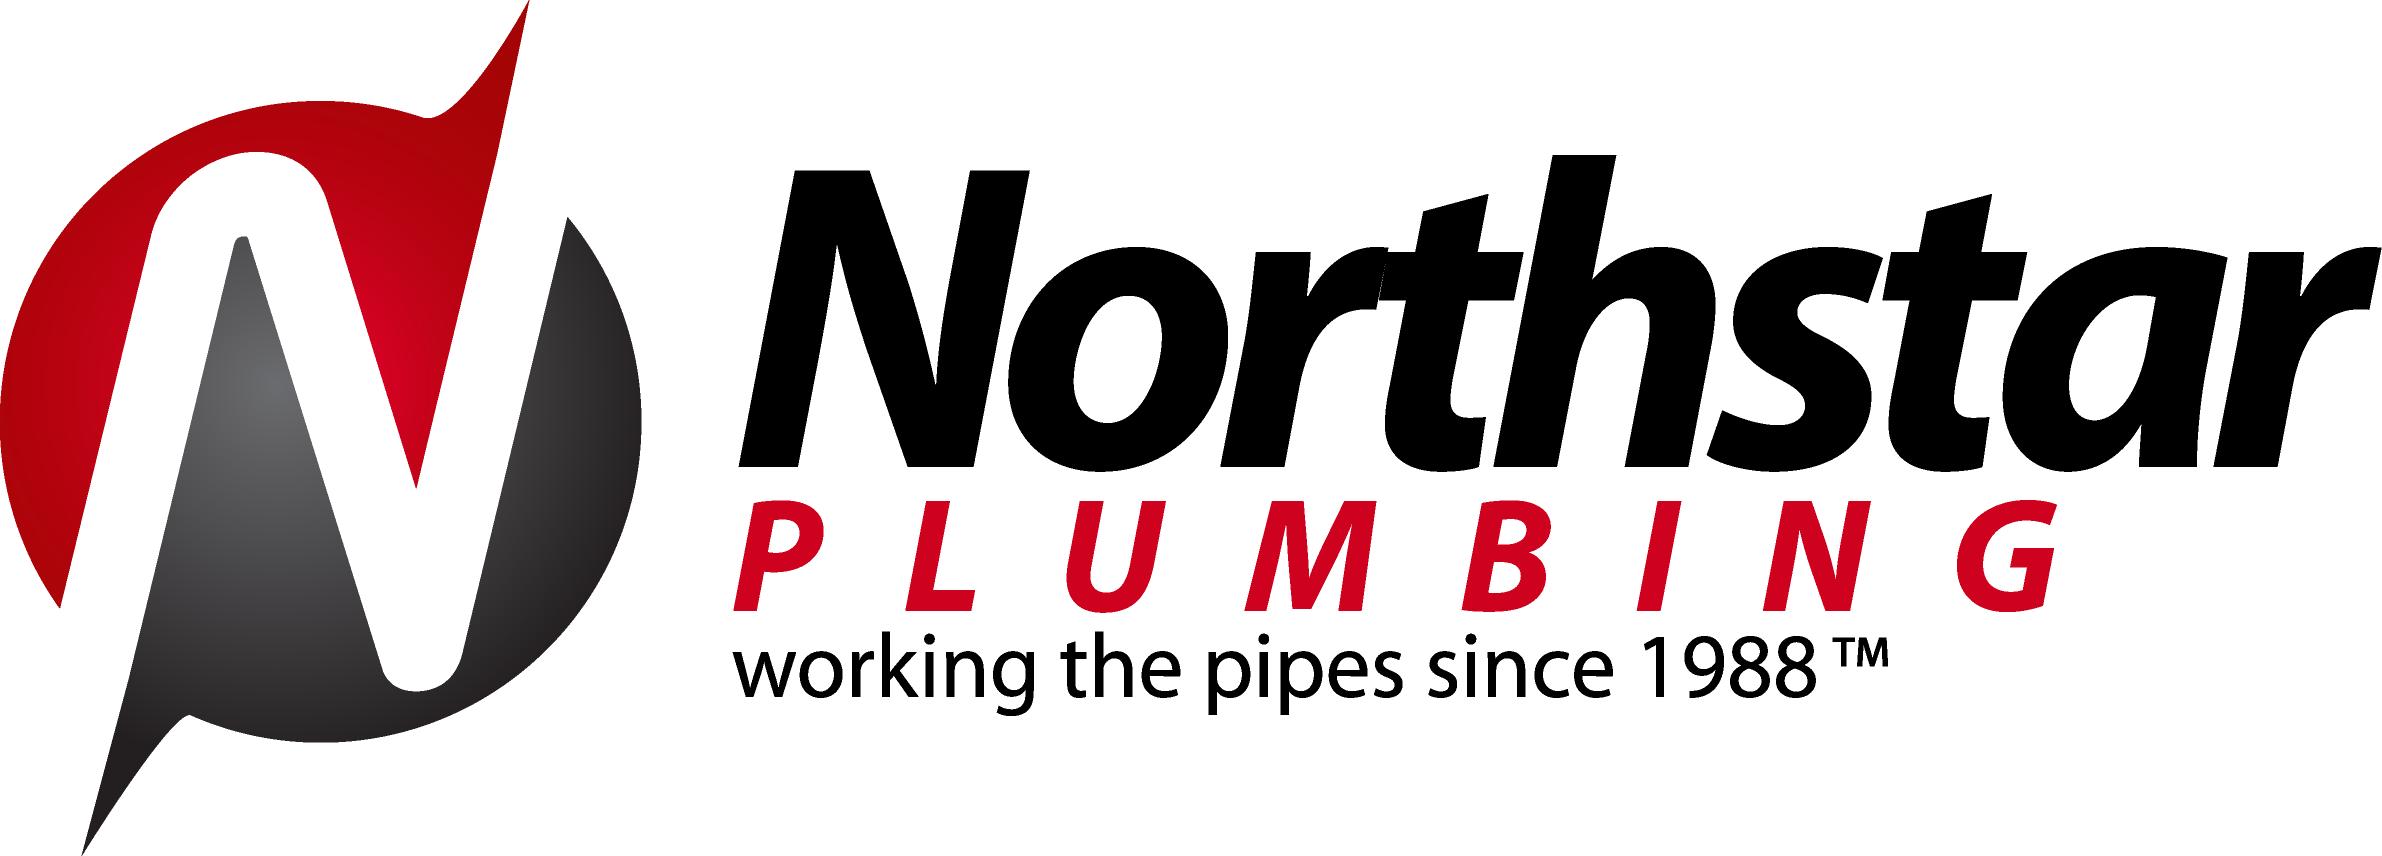 Northstar Plumbing logo